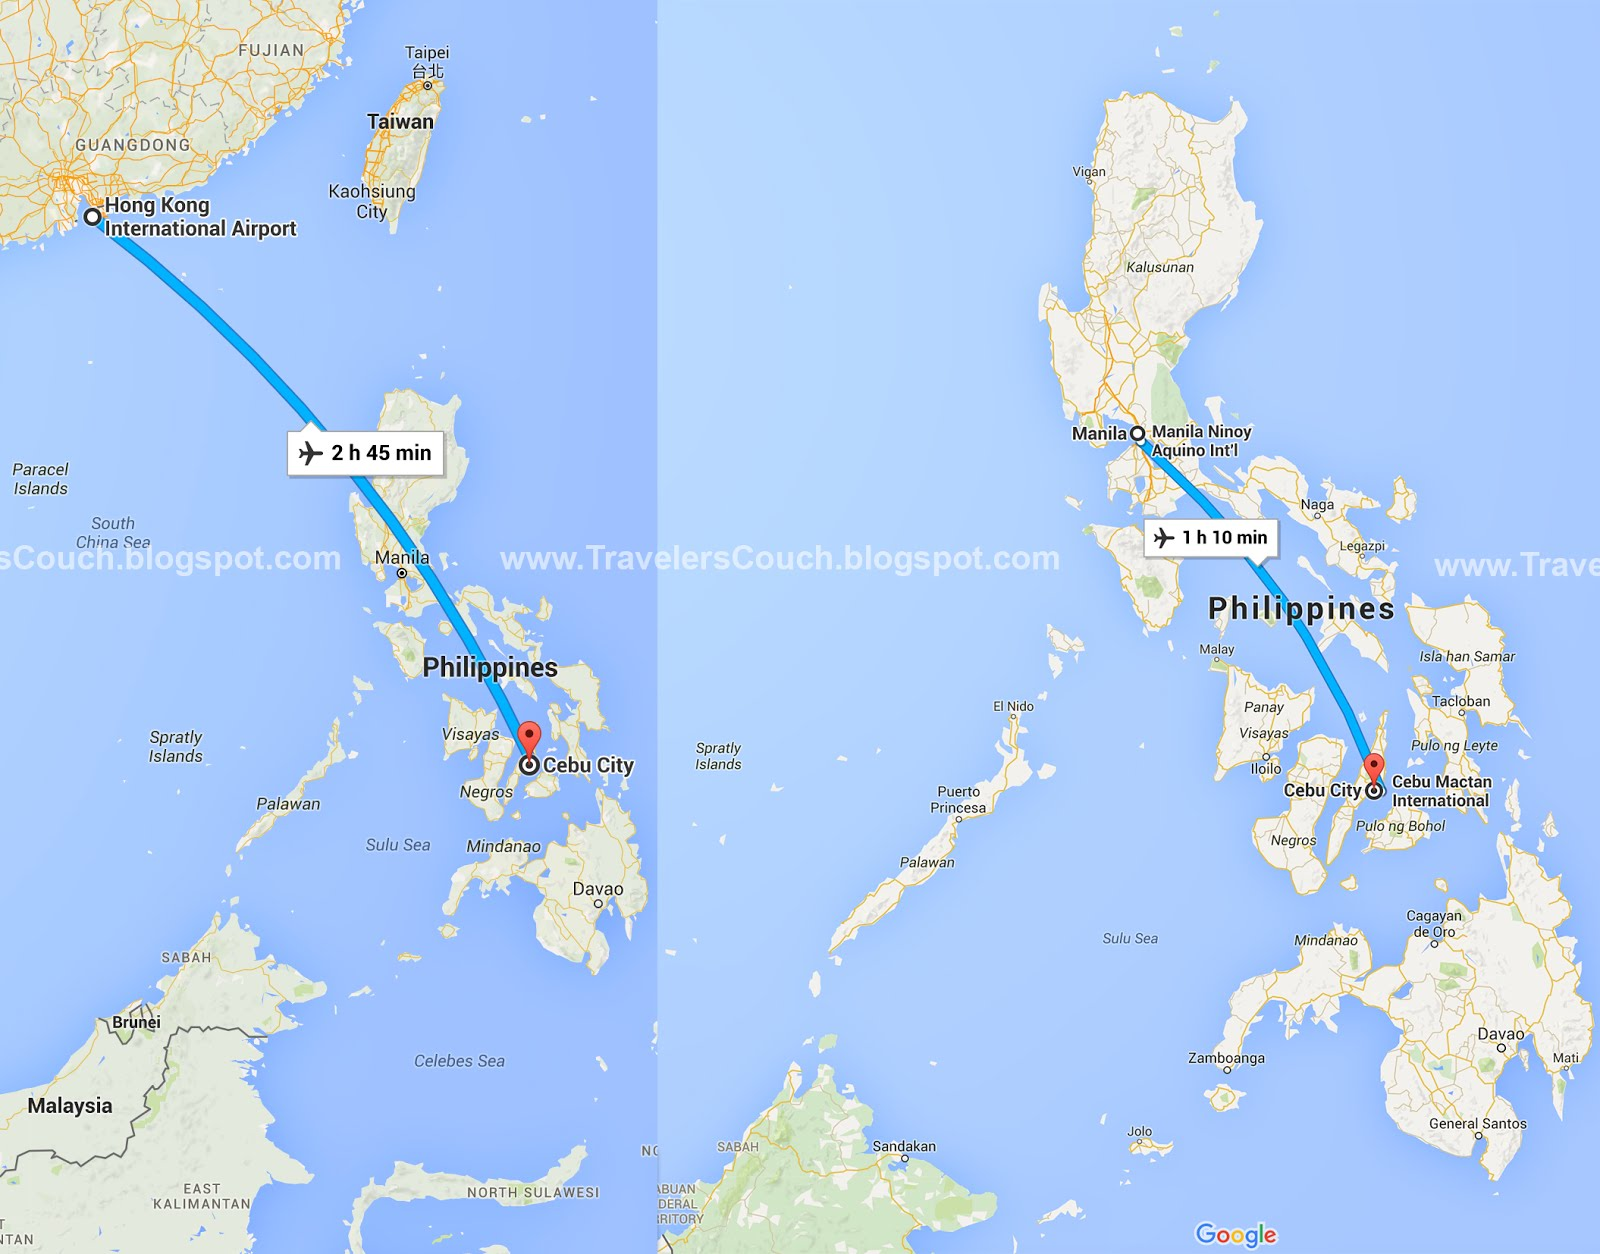 Philippines Islands World Map.Philippine Islands World Map 59892 Usbdata